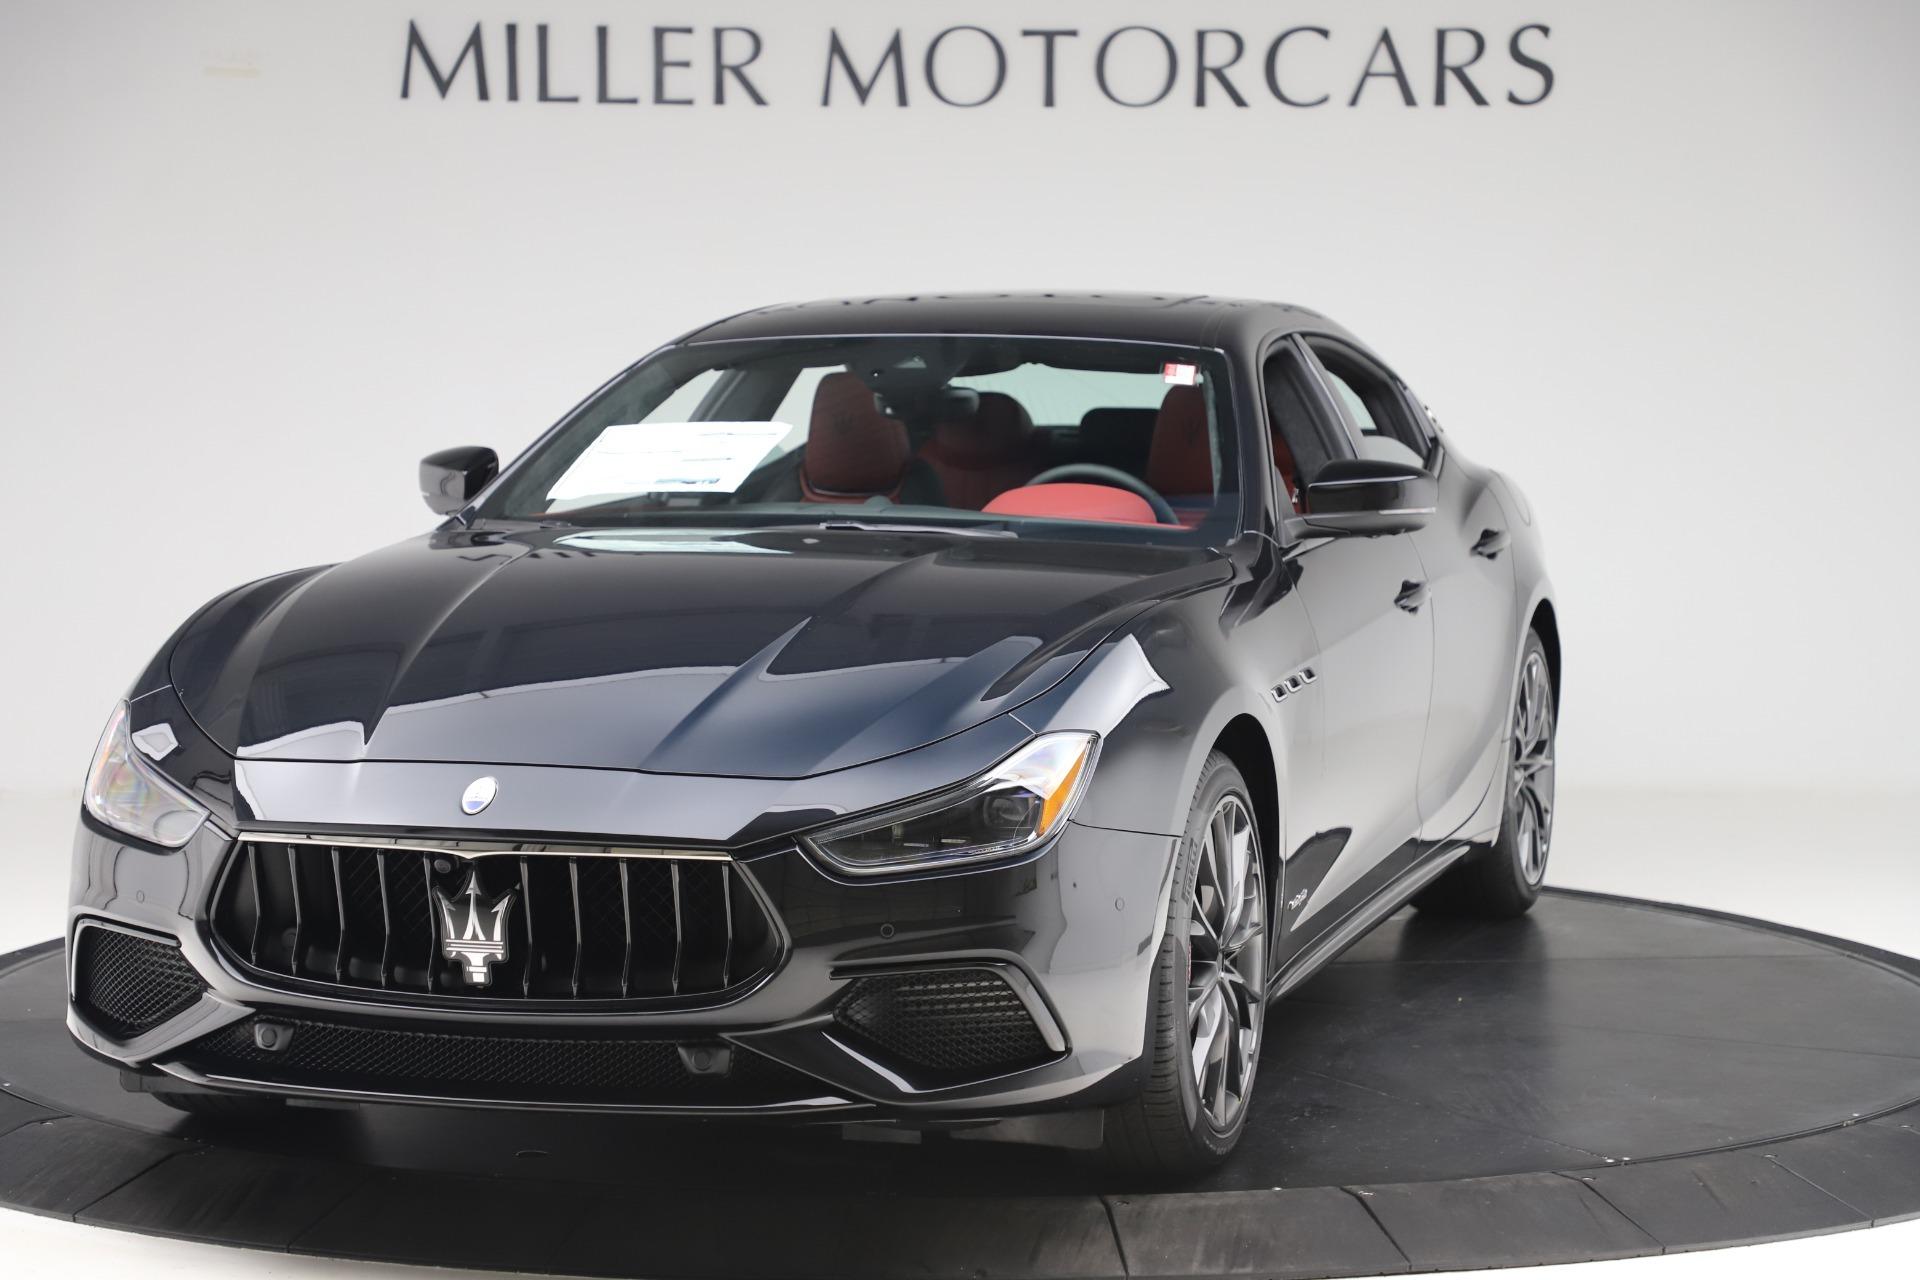 New 2020 Maserati Ghibli S Q4 GranSport for sale $94,785 at McLaren Greenwich in Greenwich CT 06830 1